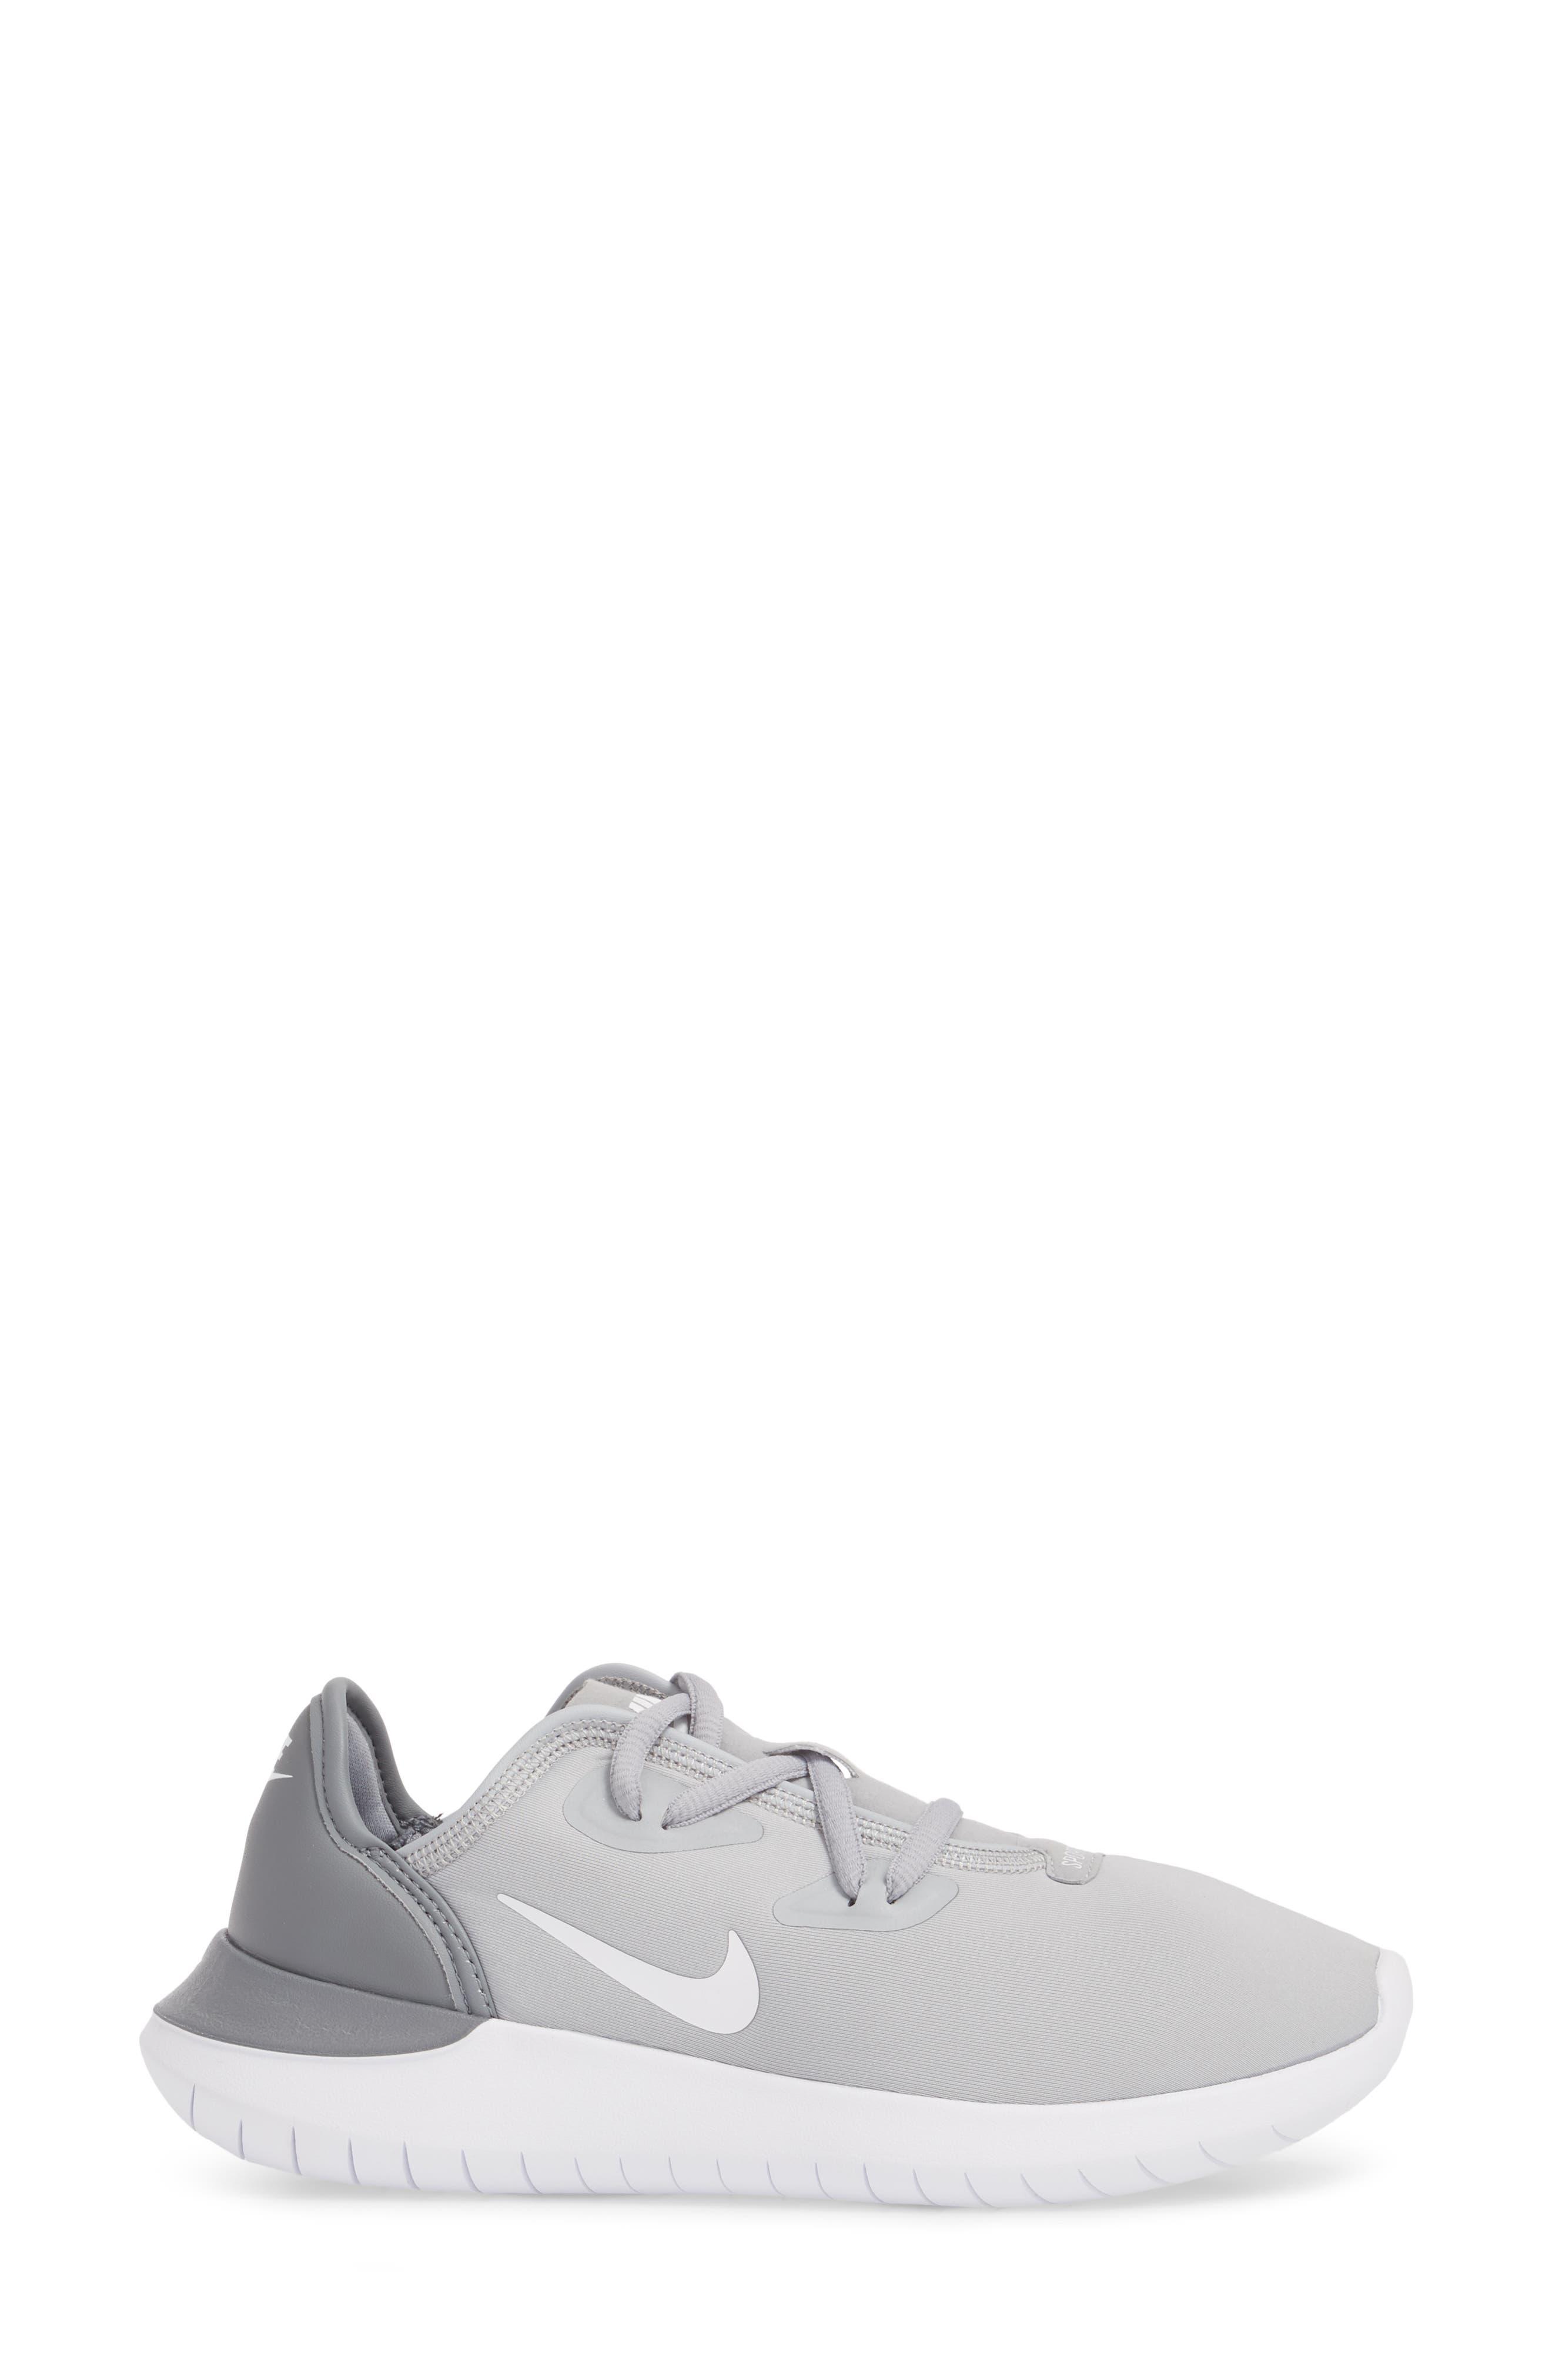 Hakata Sneaker,                             Alternate thumbnail 3, color,                             Wolf Grey/ White